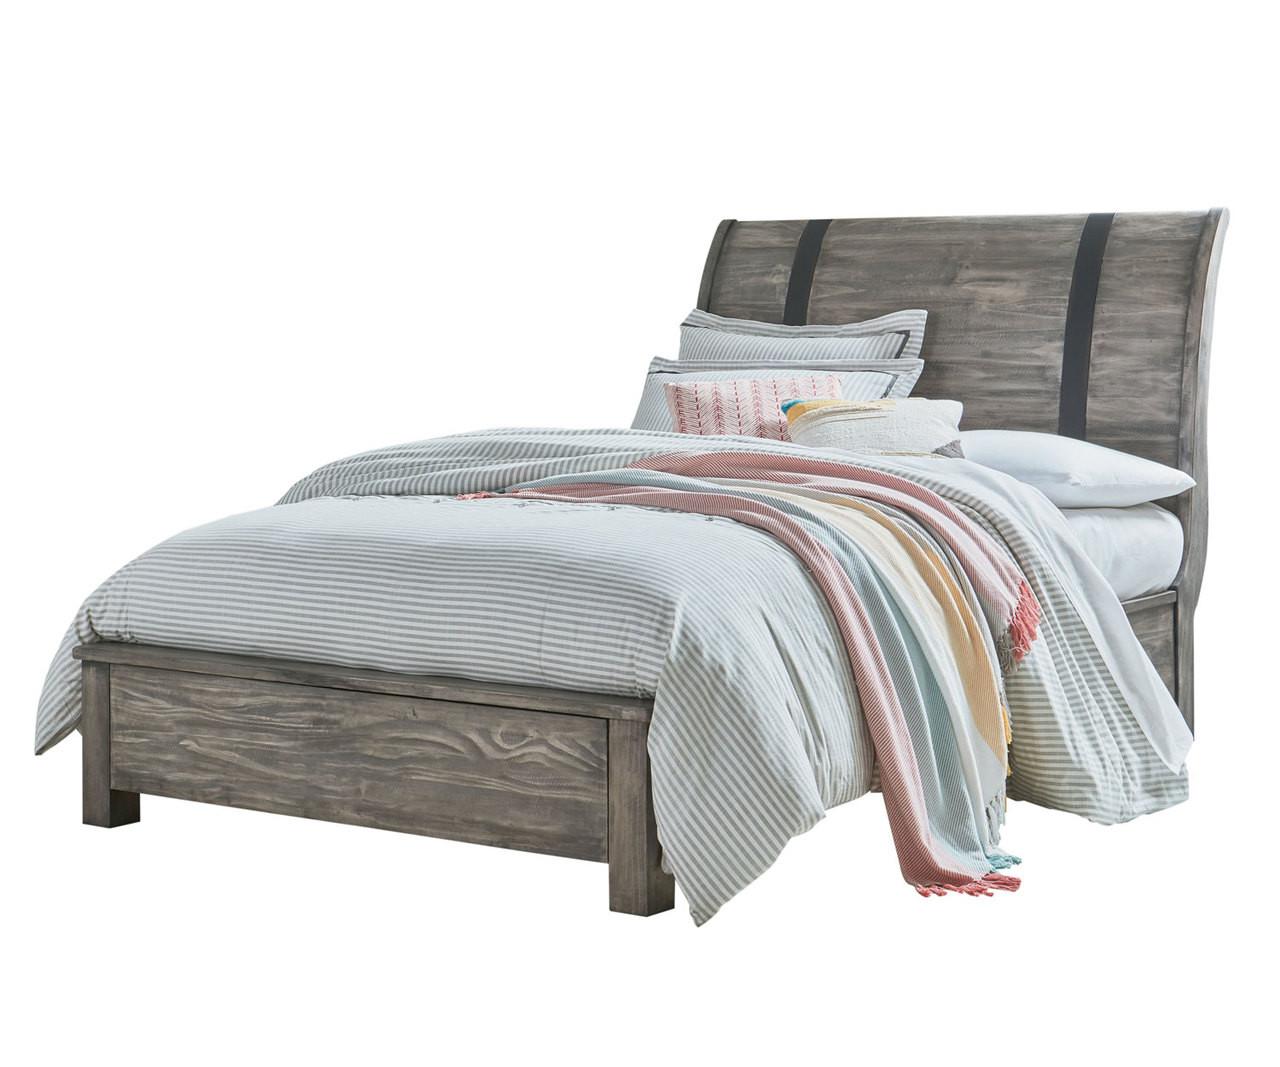 Nelson Sleigh Bed Full Size Grey Finish 90350 Standard Furniture Kids Bedroom Set